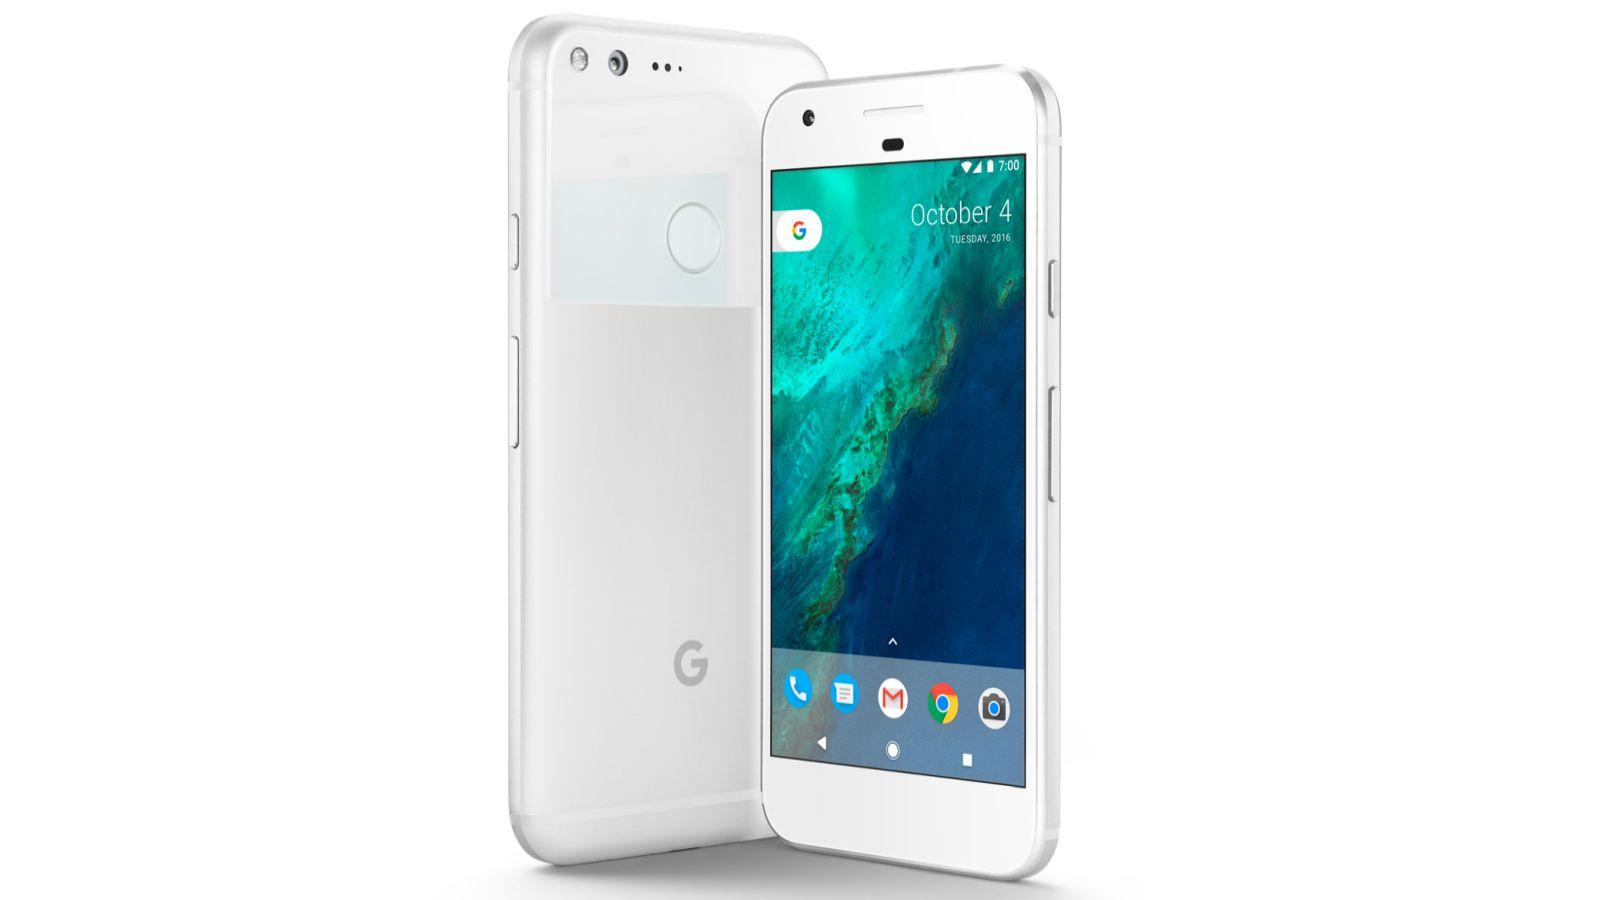 google pixel google pixel xl Galaxy Note 7